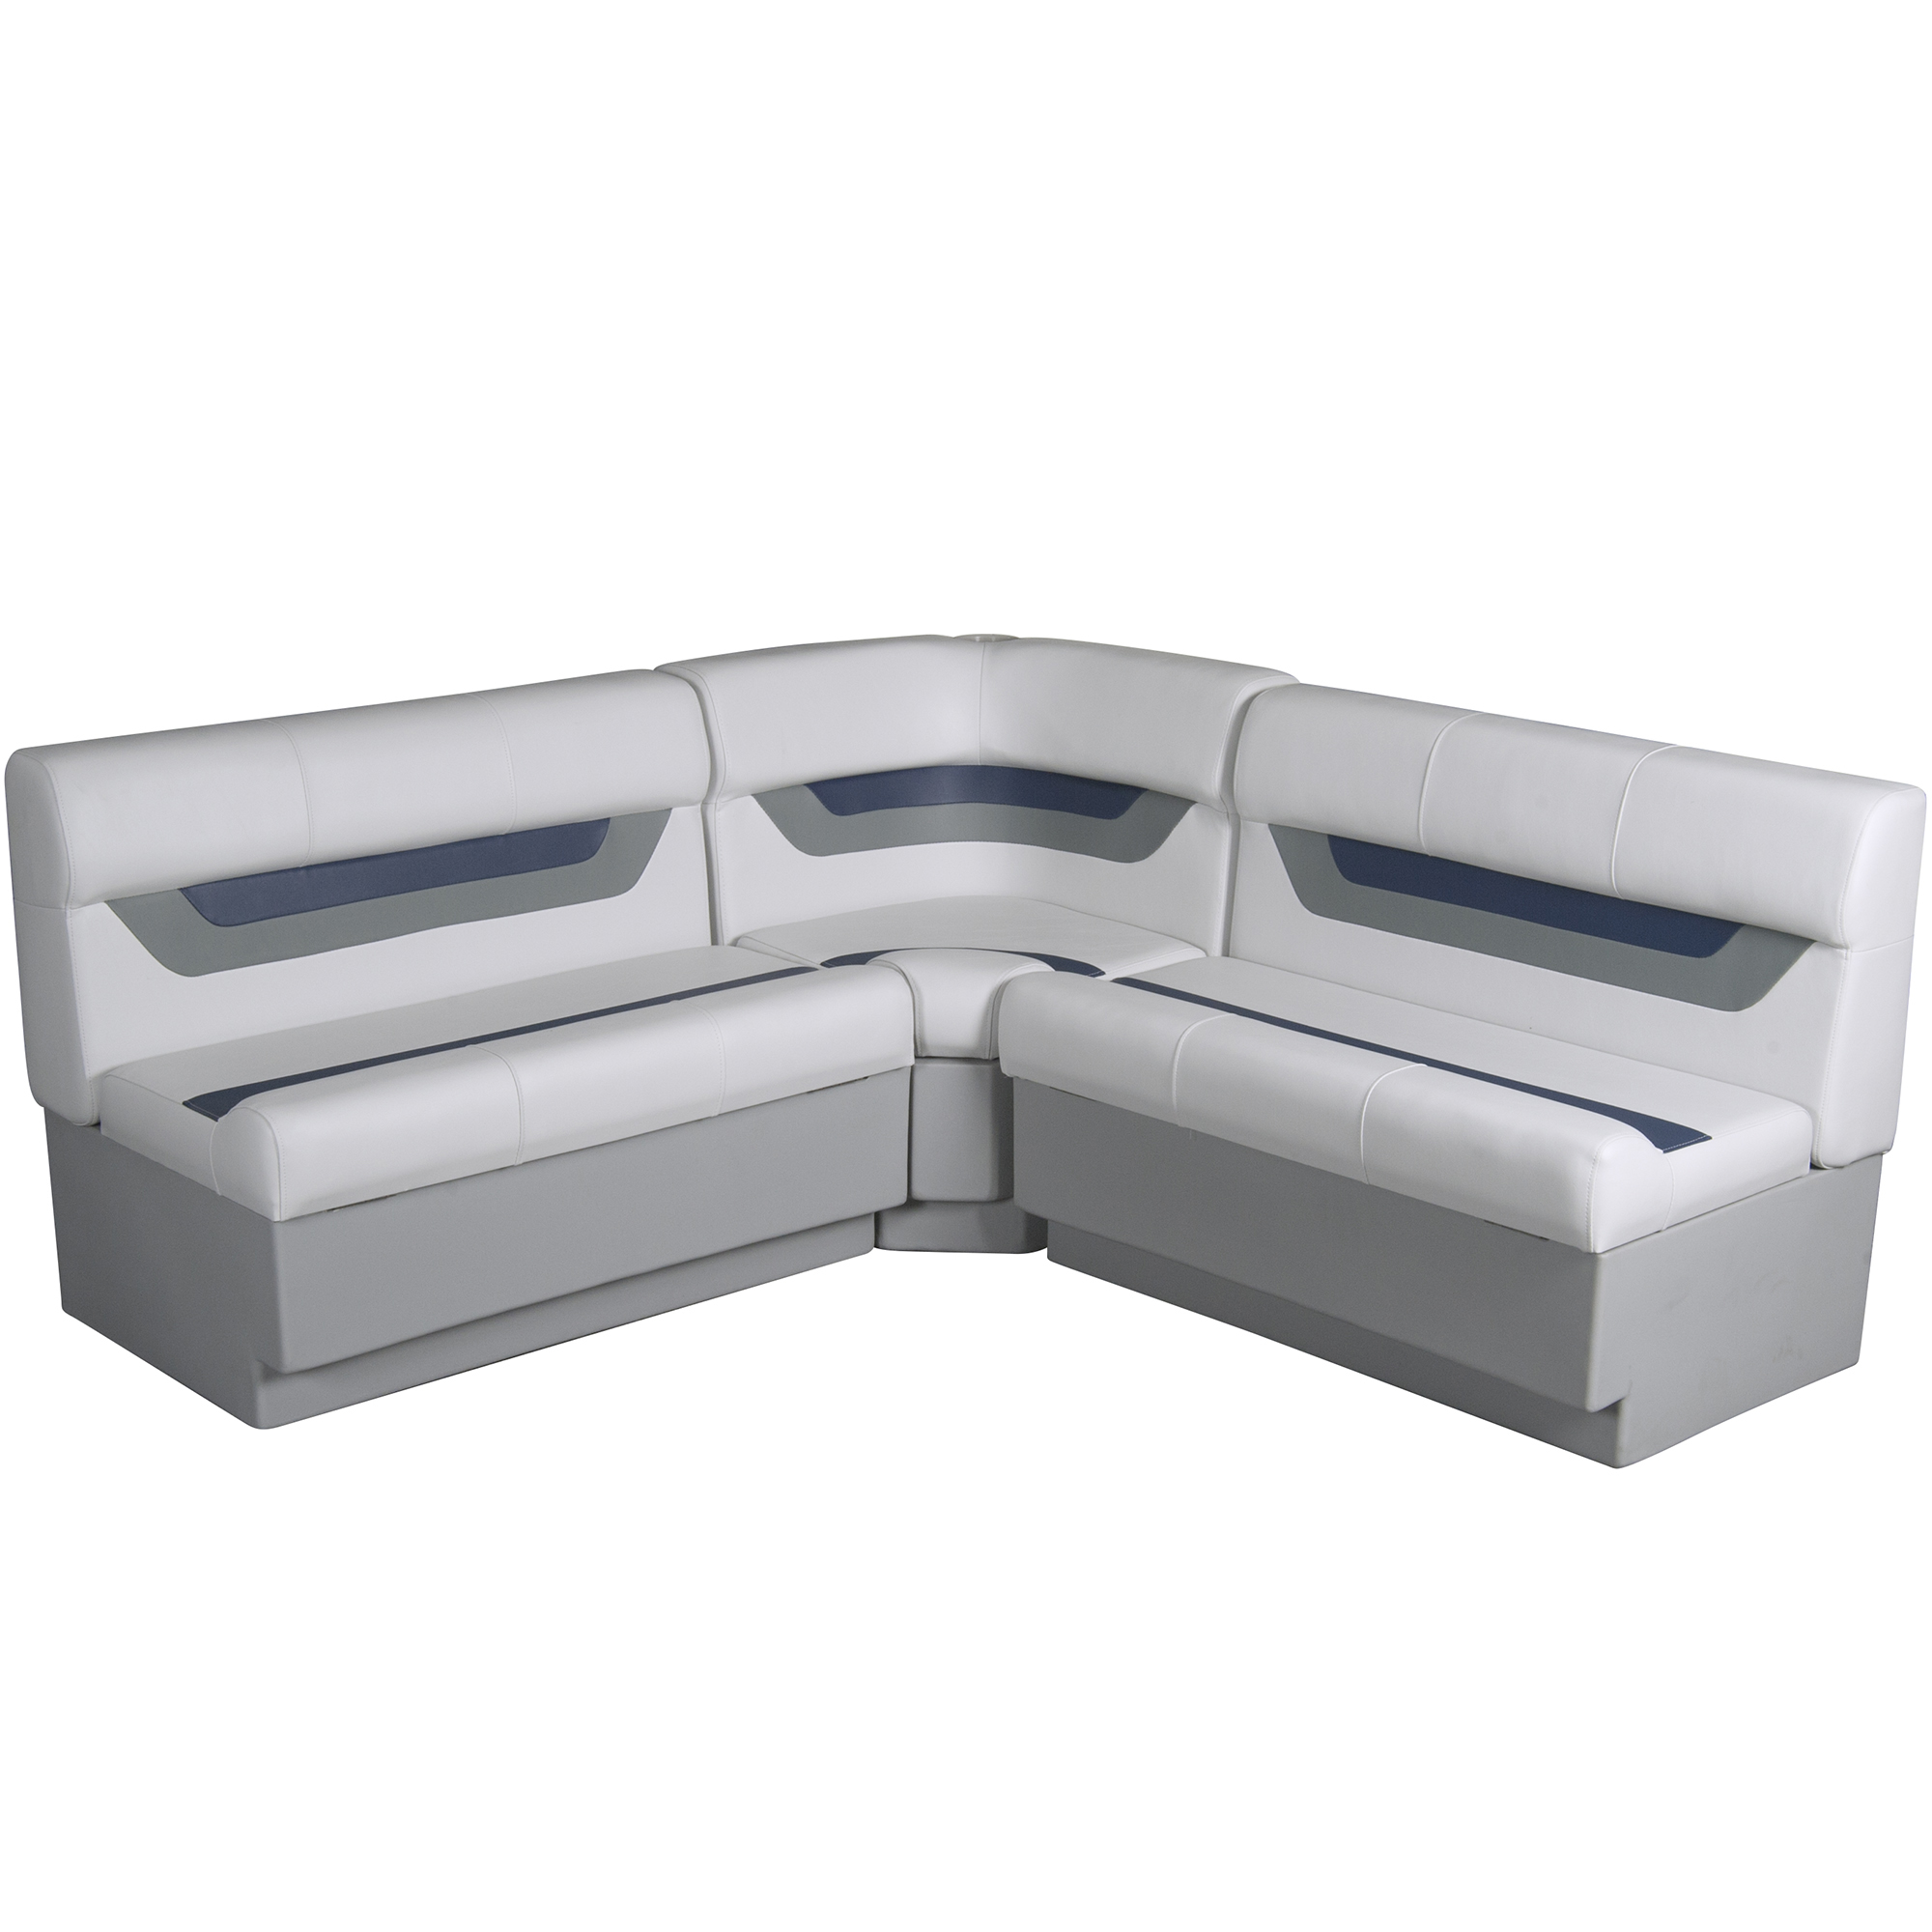 "Designer Pontoon Furniture - 61"" Rear Wraparound Package, Sky Gray/Navy"